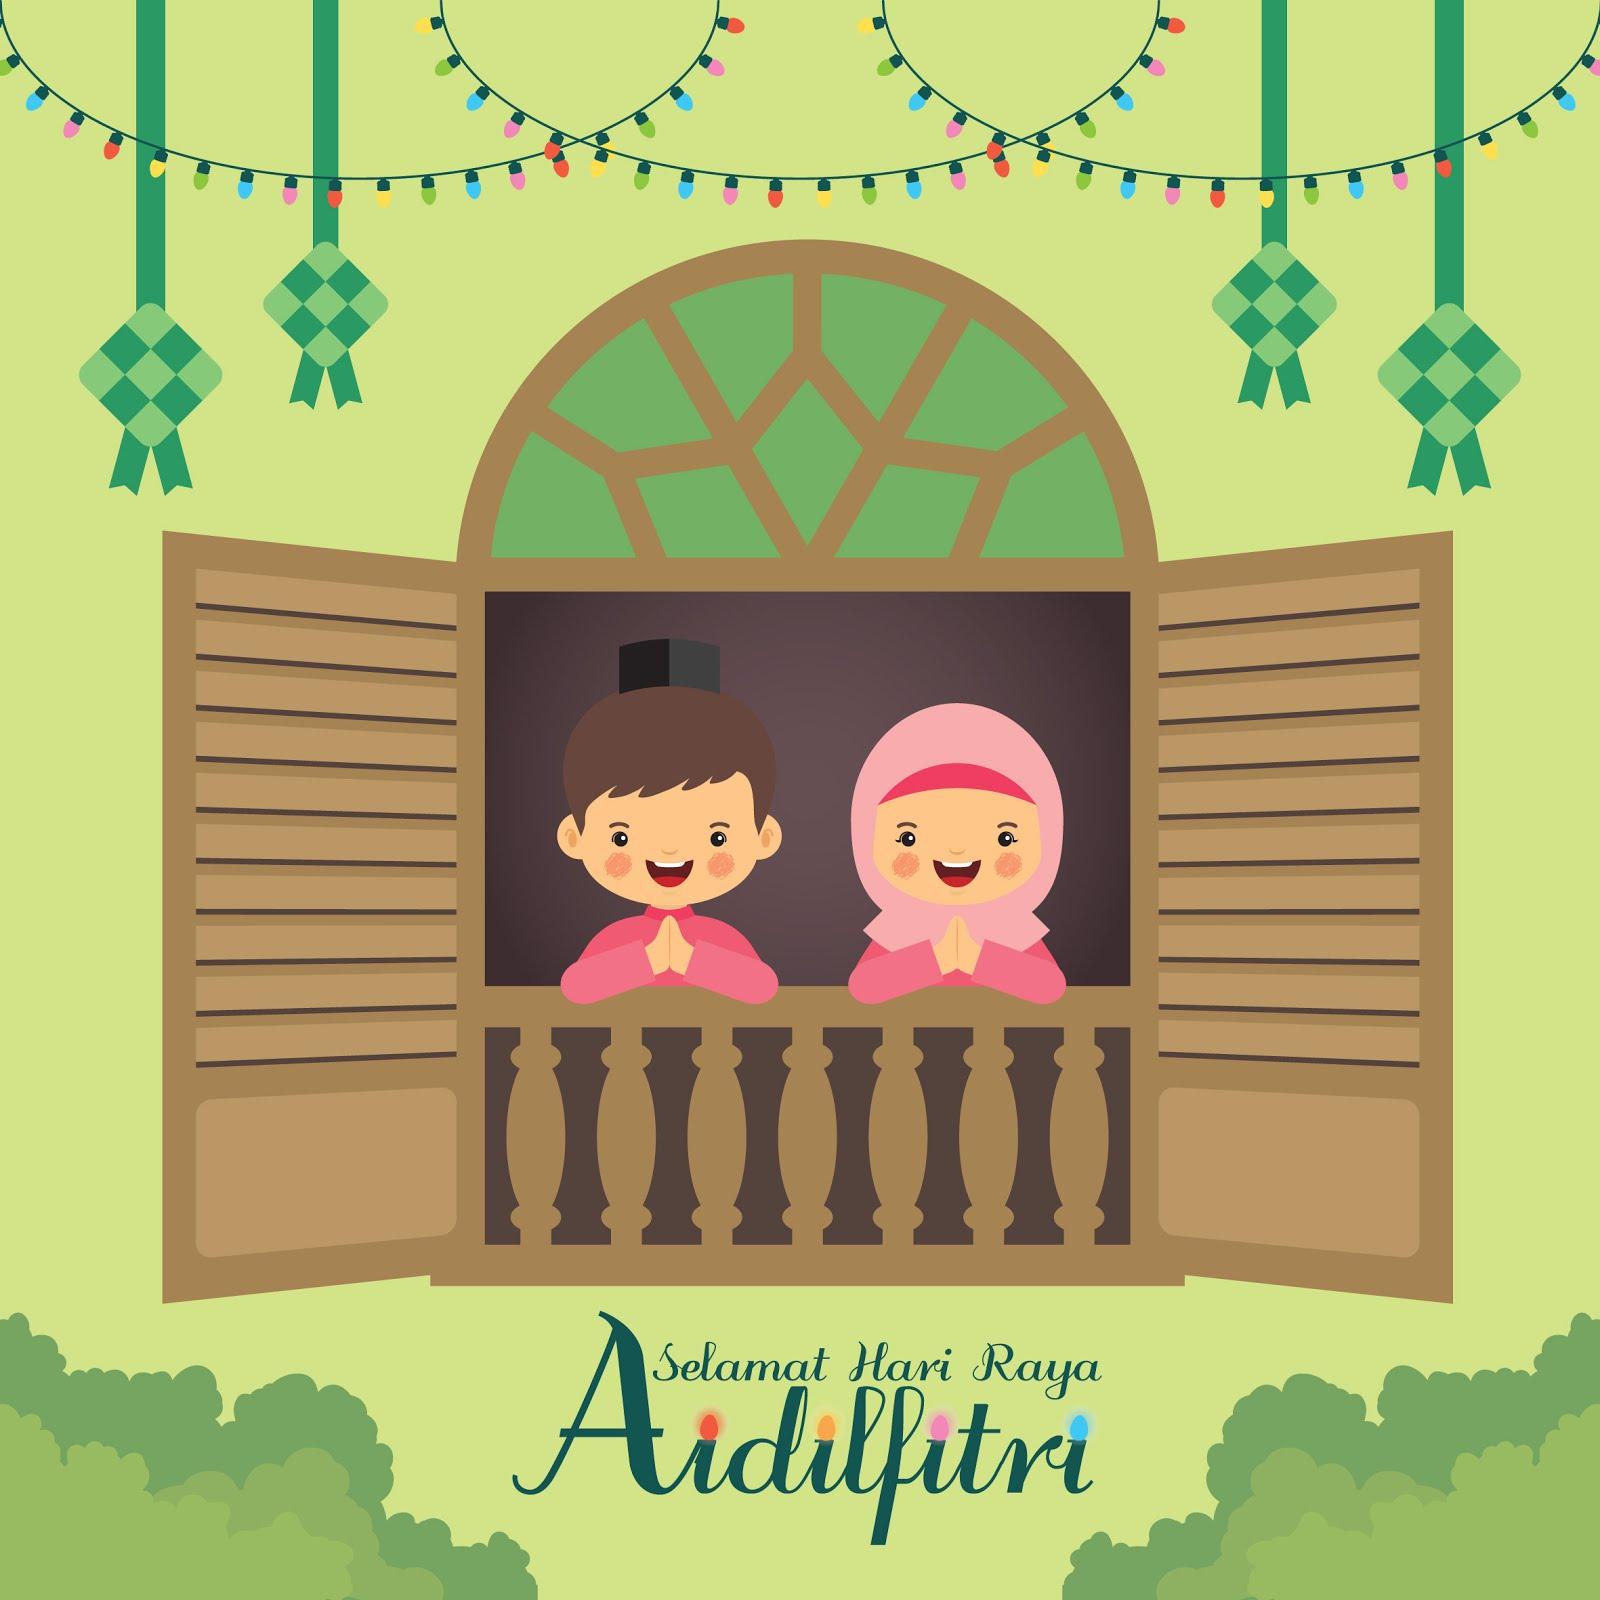 Bentuk Ucapan Idul Fitri Yang Benar Menurut Islam